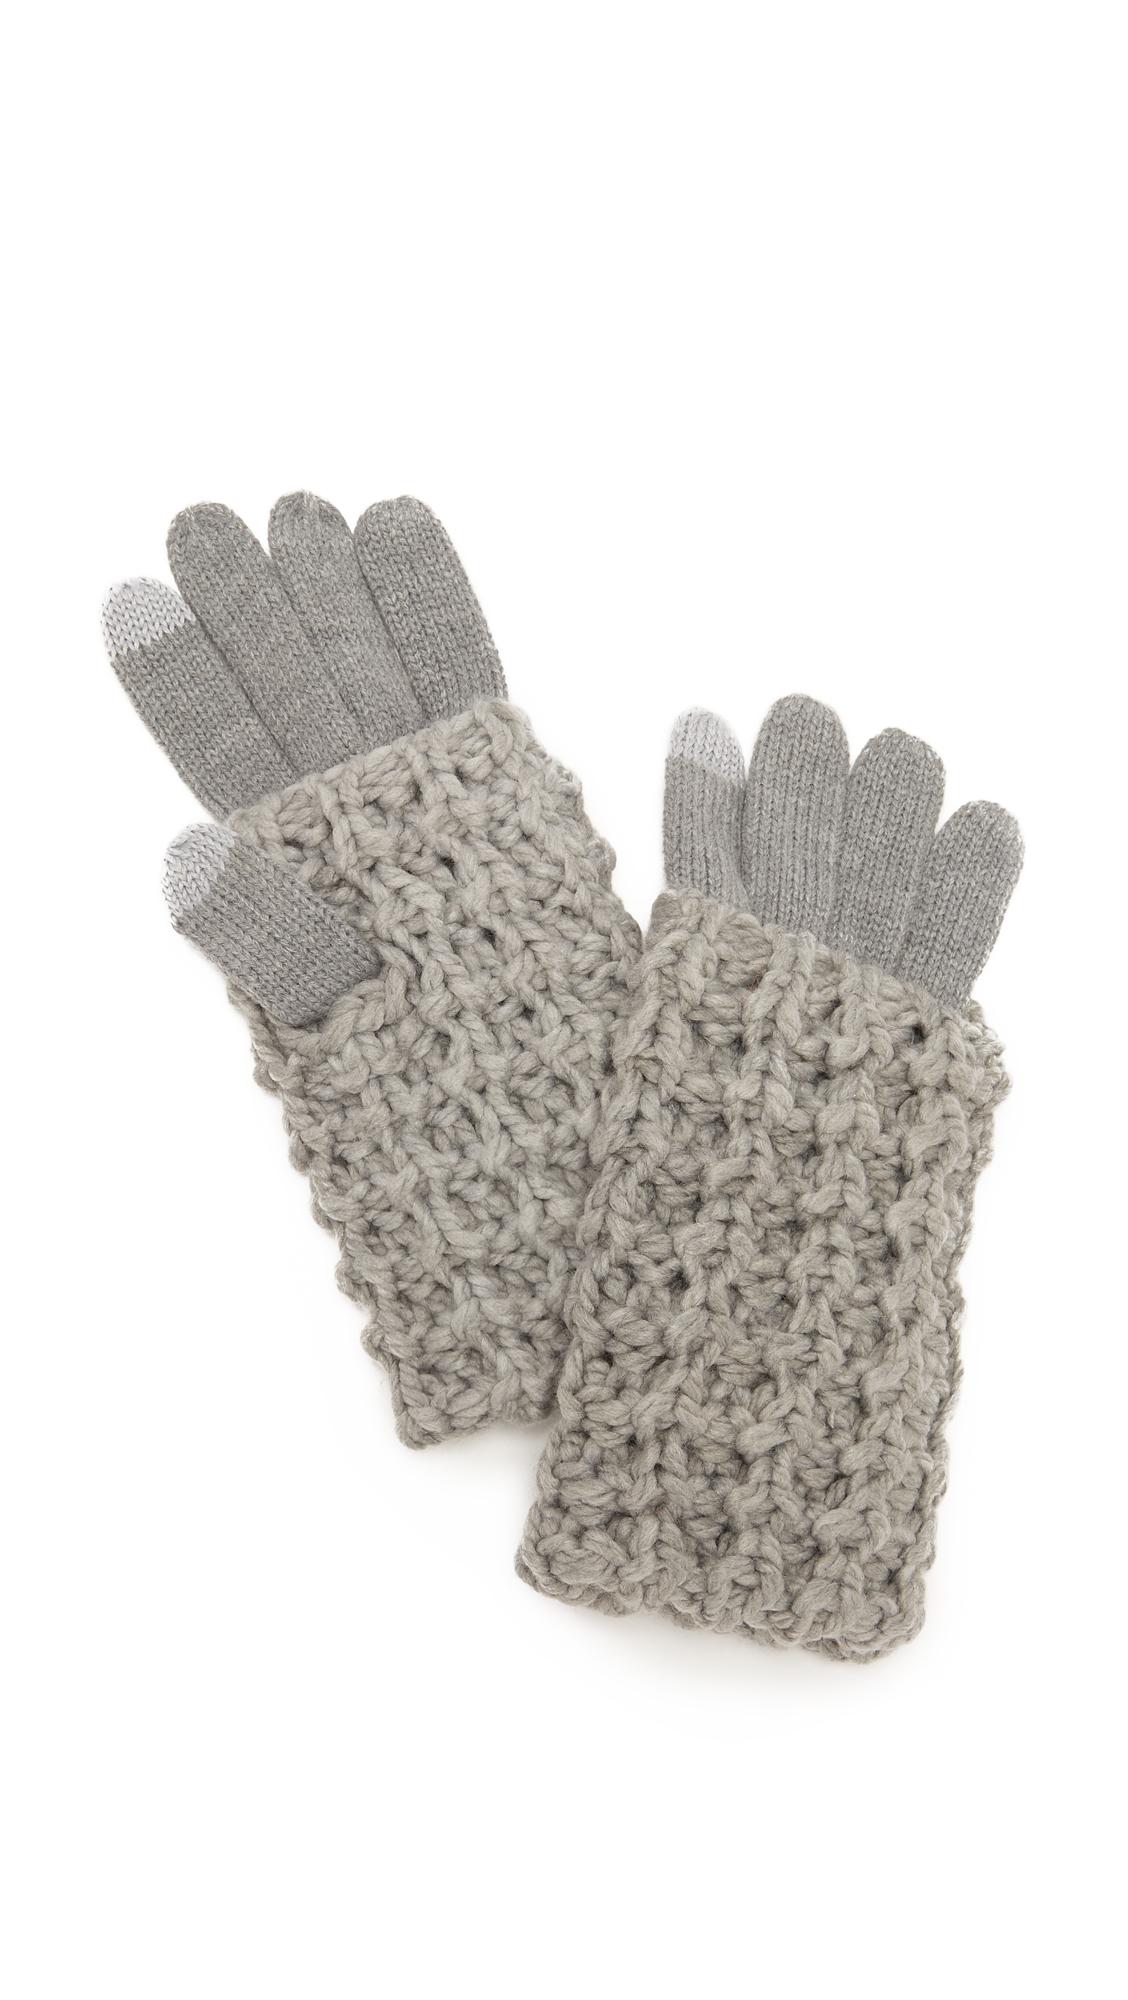 Rebecca Minkoff Chunky Tuck Gloves - Heather Grey